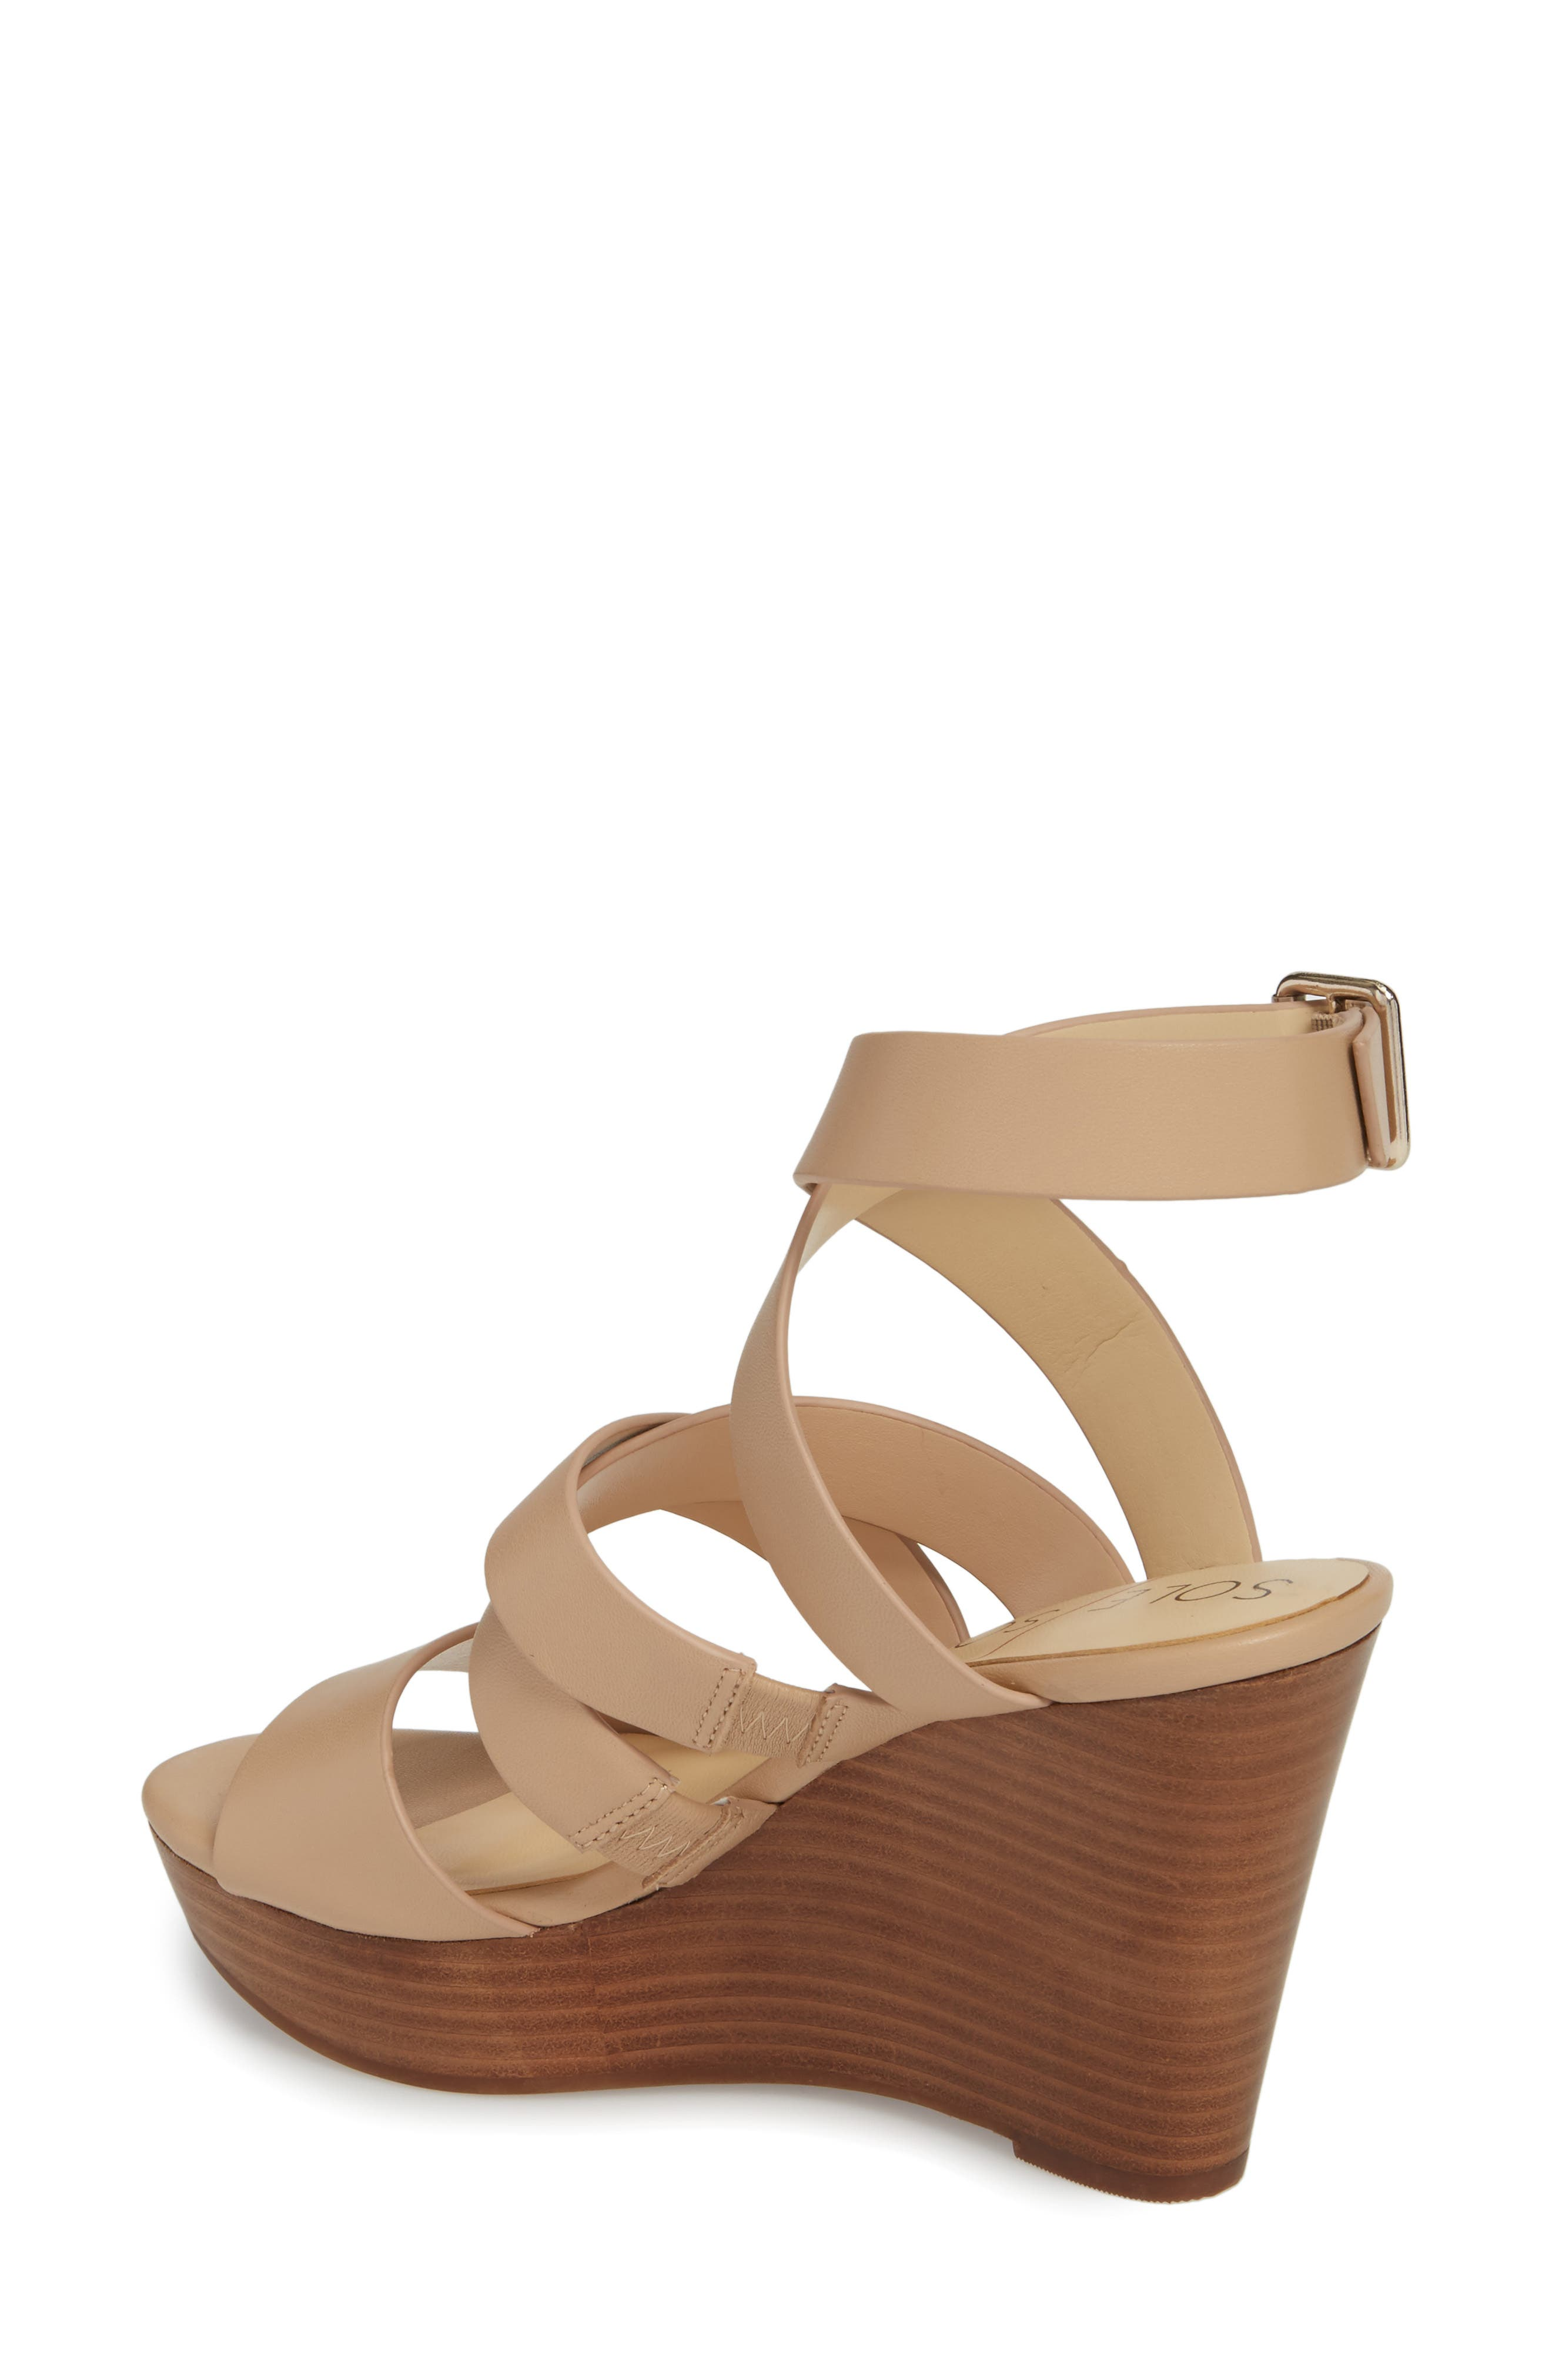 Pippy Platform Sandal,                             Alternate thumbnail 2, color,                             Tan